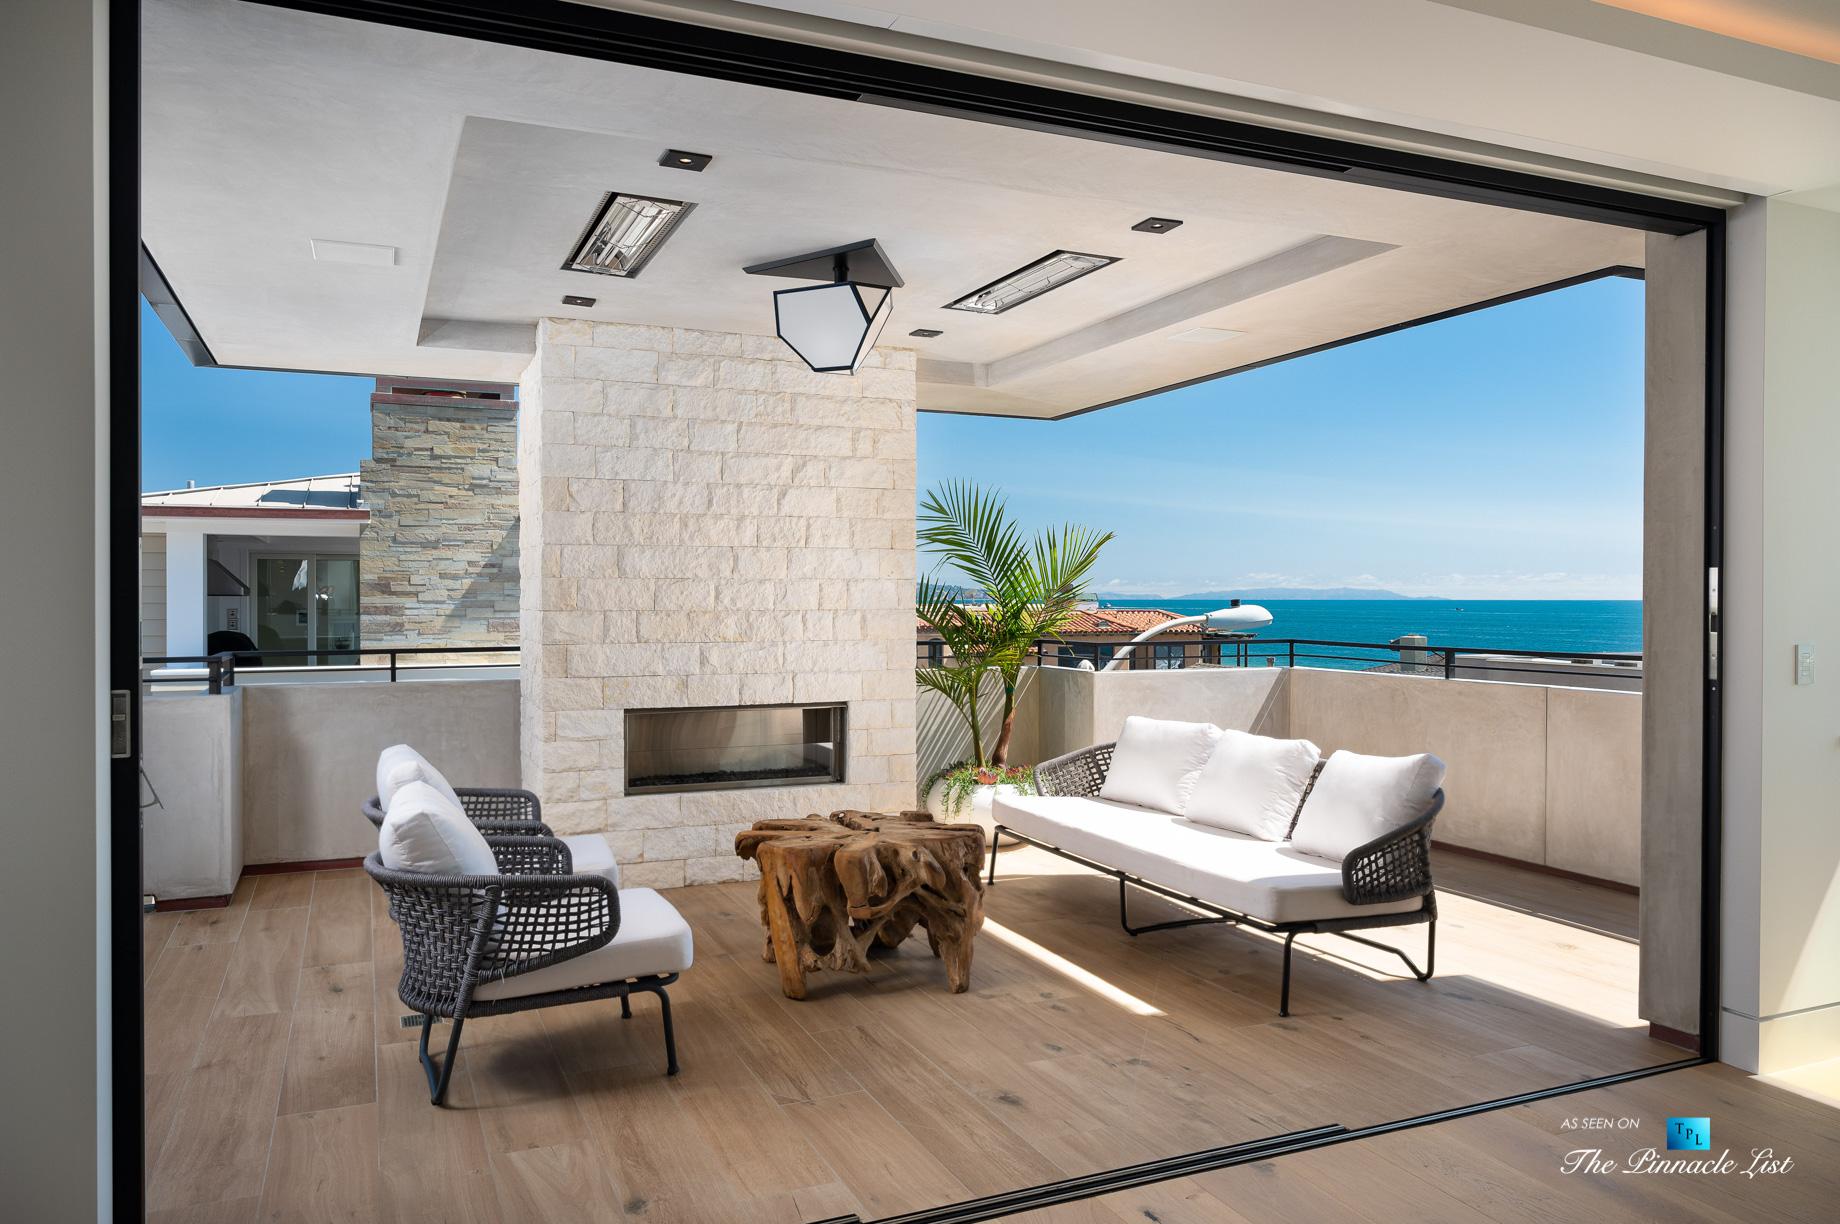 2016 Ocean Dr, Manhattan Beach, CA, USA – Covered Exterior Balcony View – Luxury Real Estate – Modern Ocean View Home